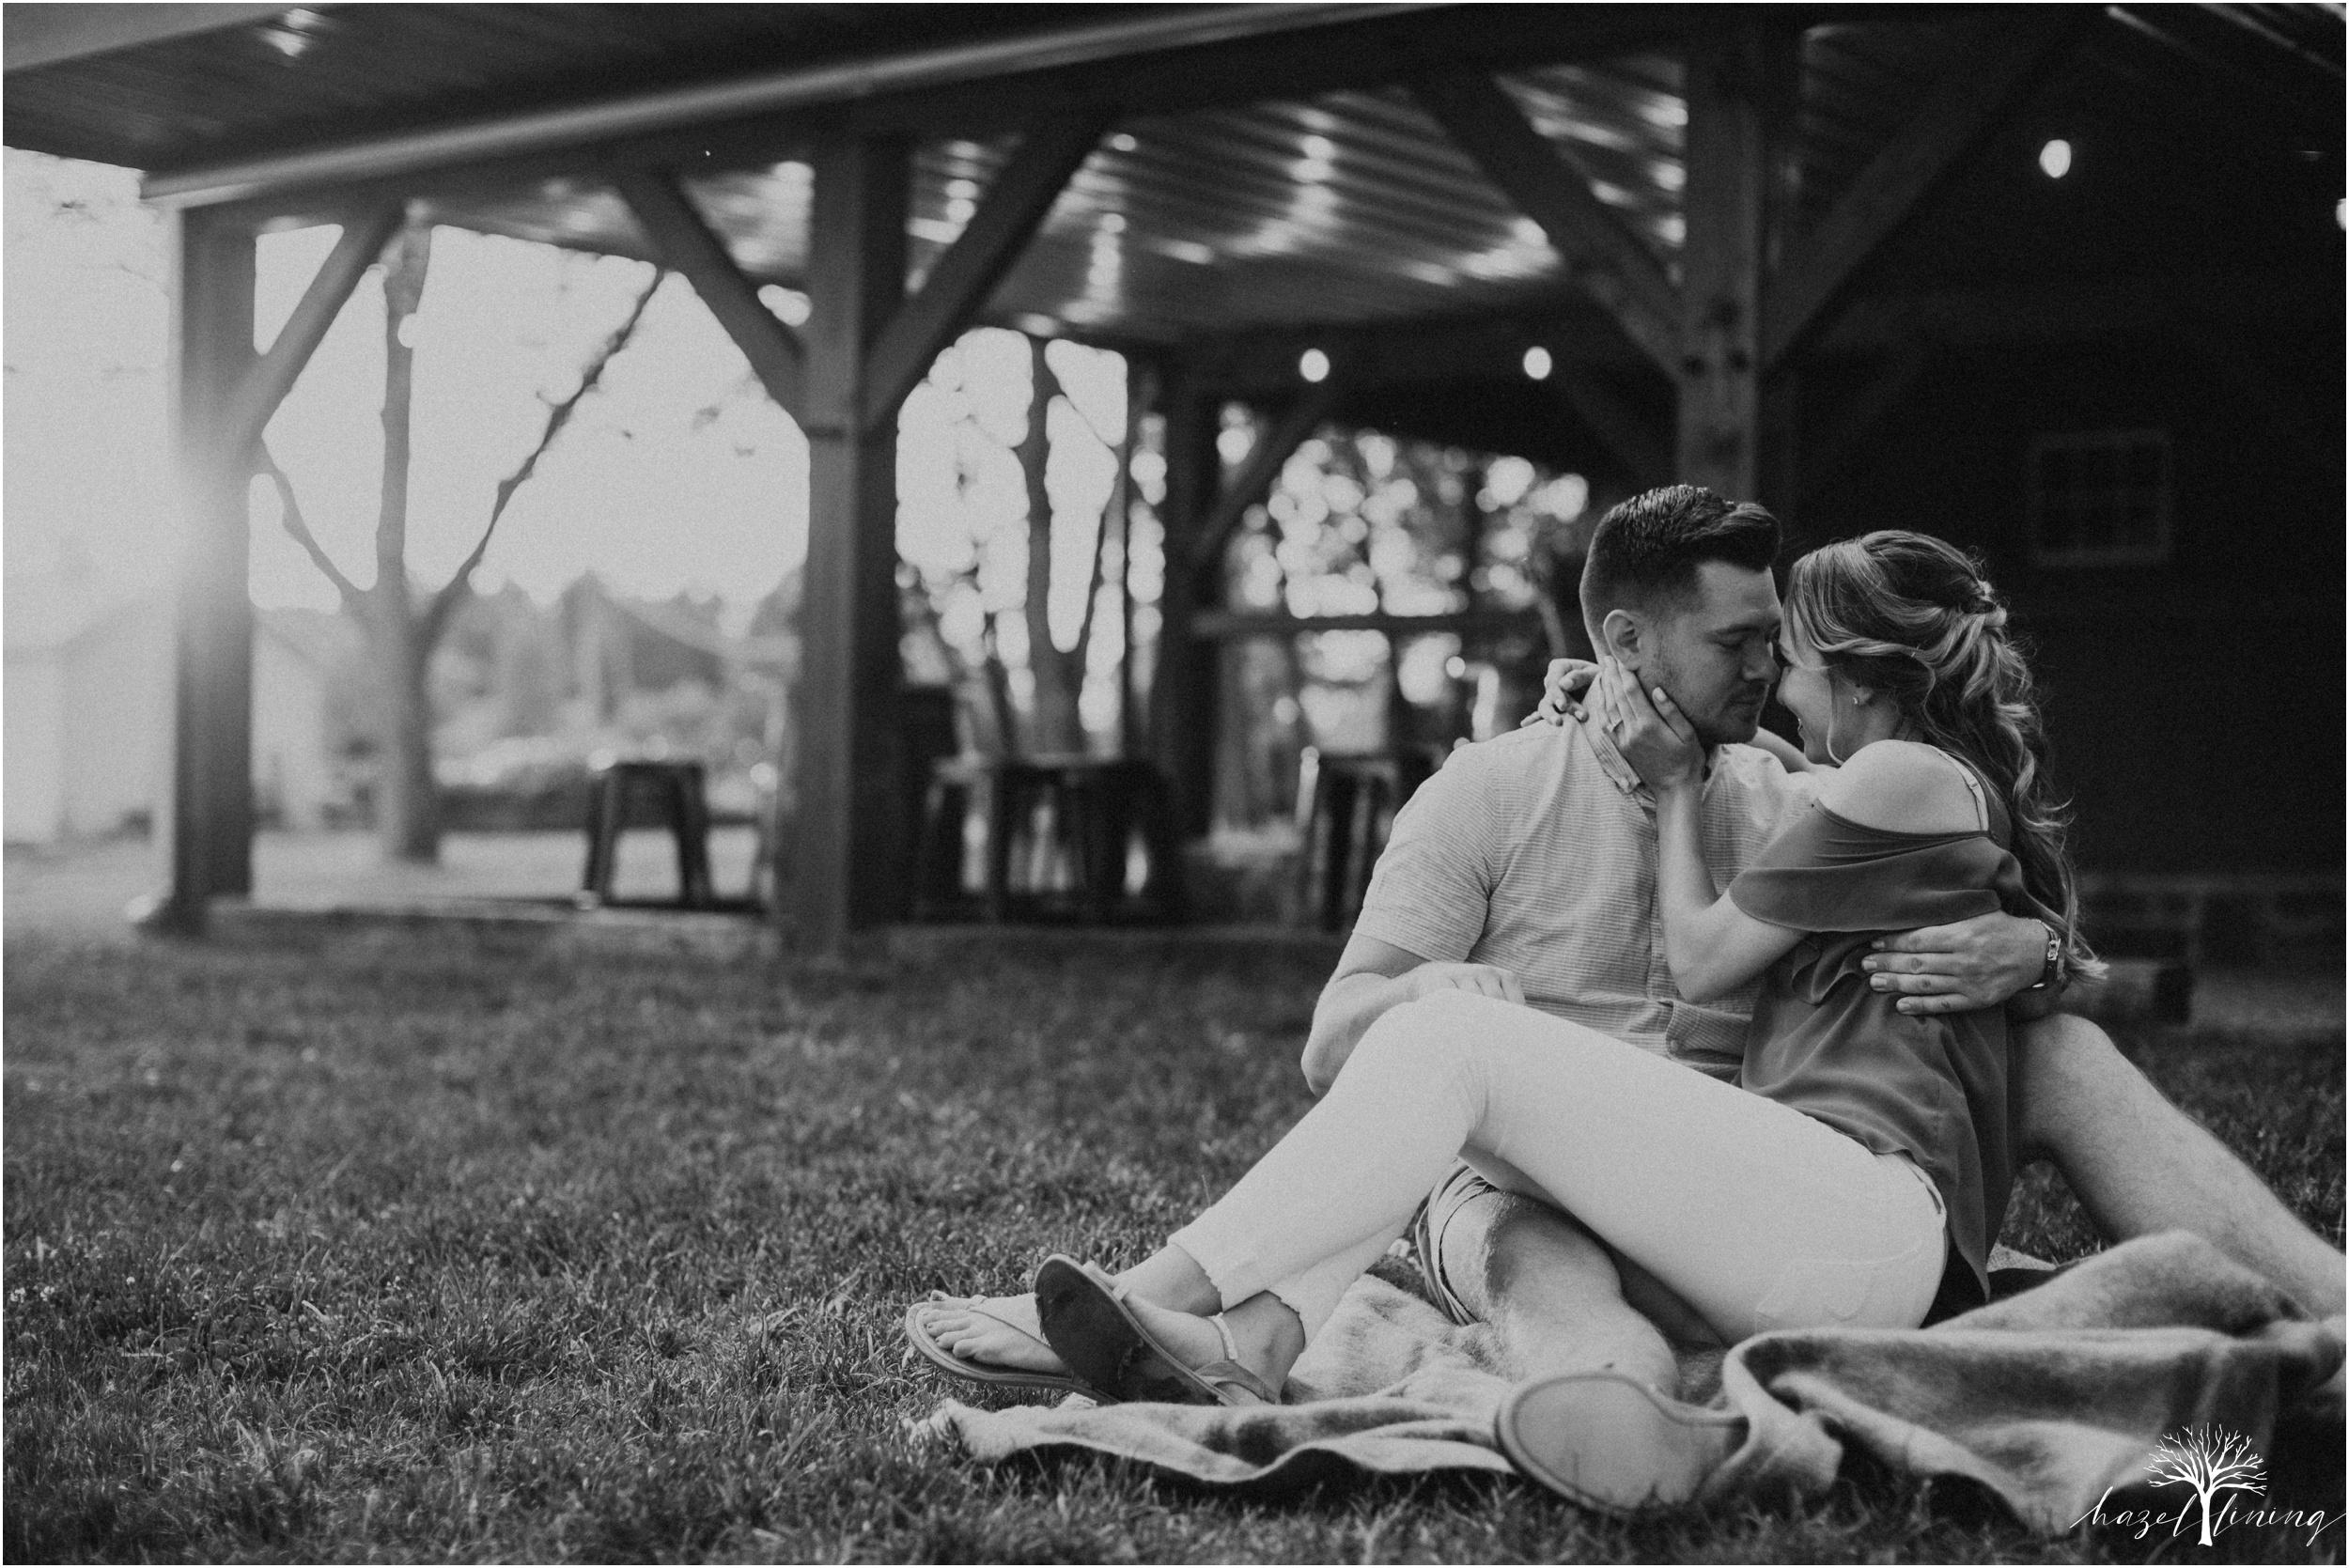 rachel-warner-chris-niedrist-the-farm-bakery-and-events-quakertown-pa-summer-engagement-hazel-lining-photography-destination-elopement-wedding-engagement-photography_0069.jpg